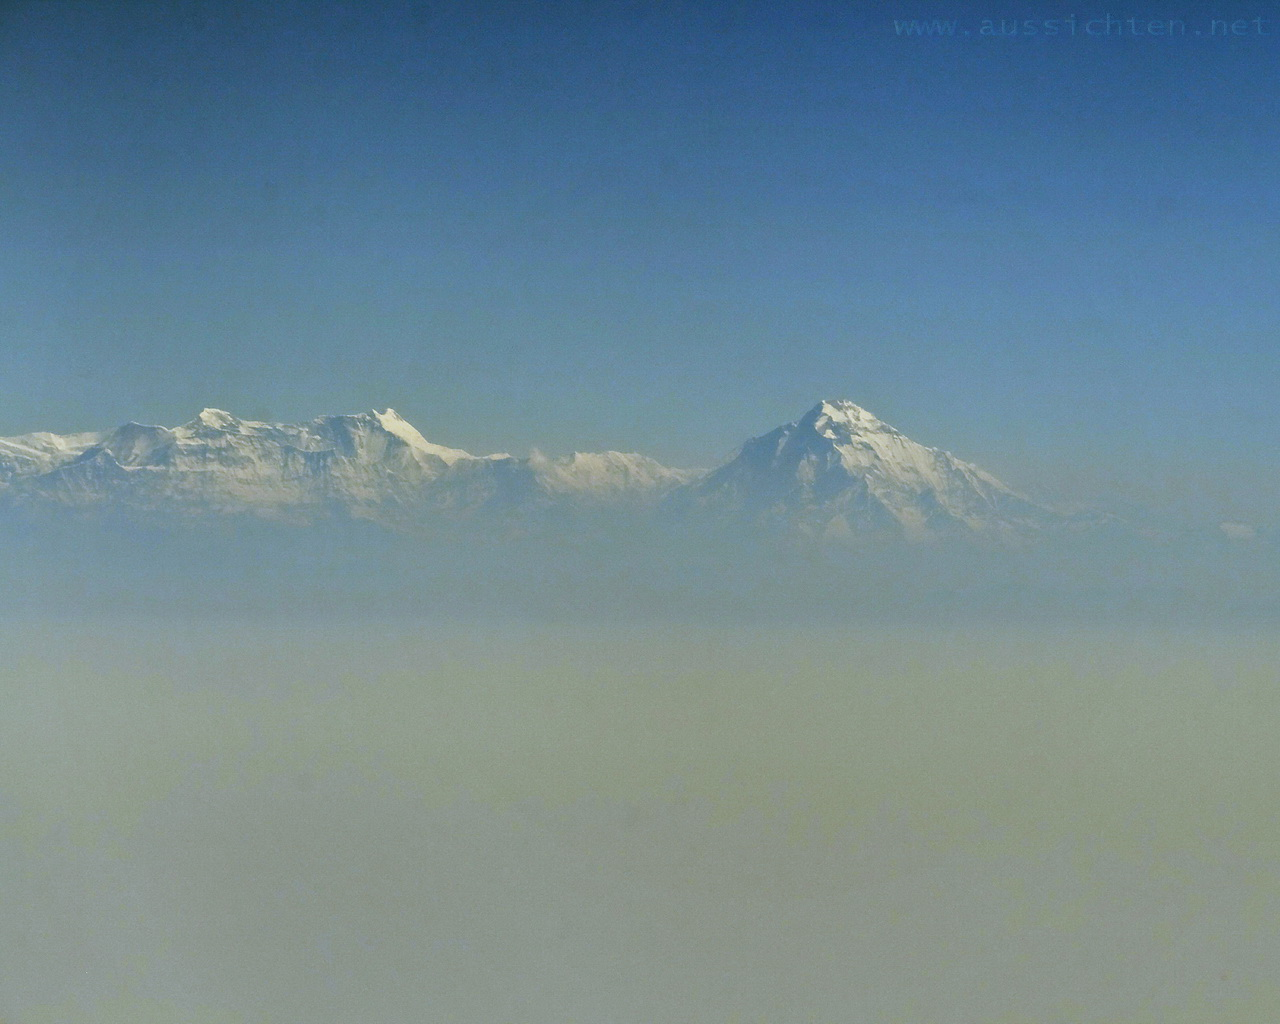 Hauptmenü hintergründe dhaulagiri 8167 meter nepal